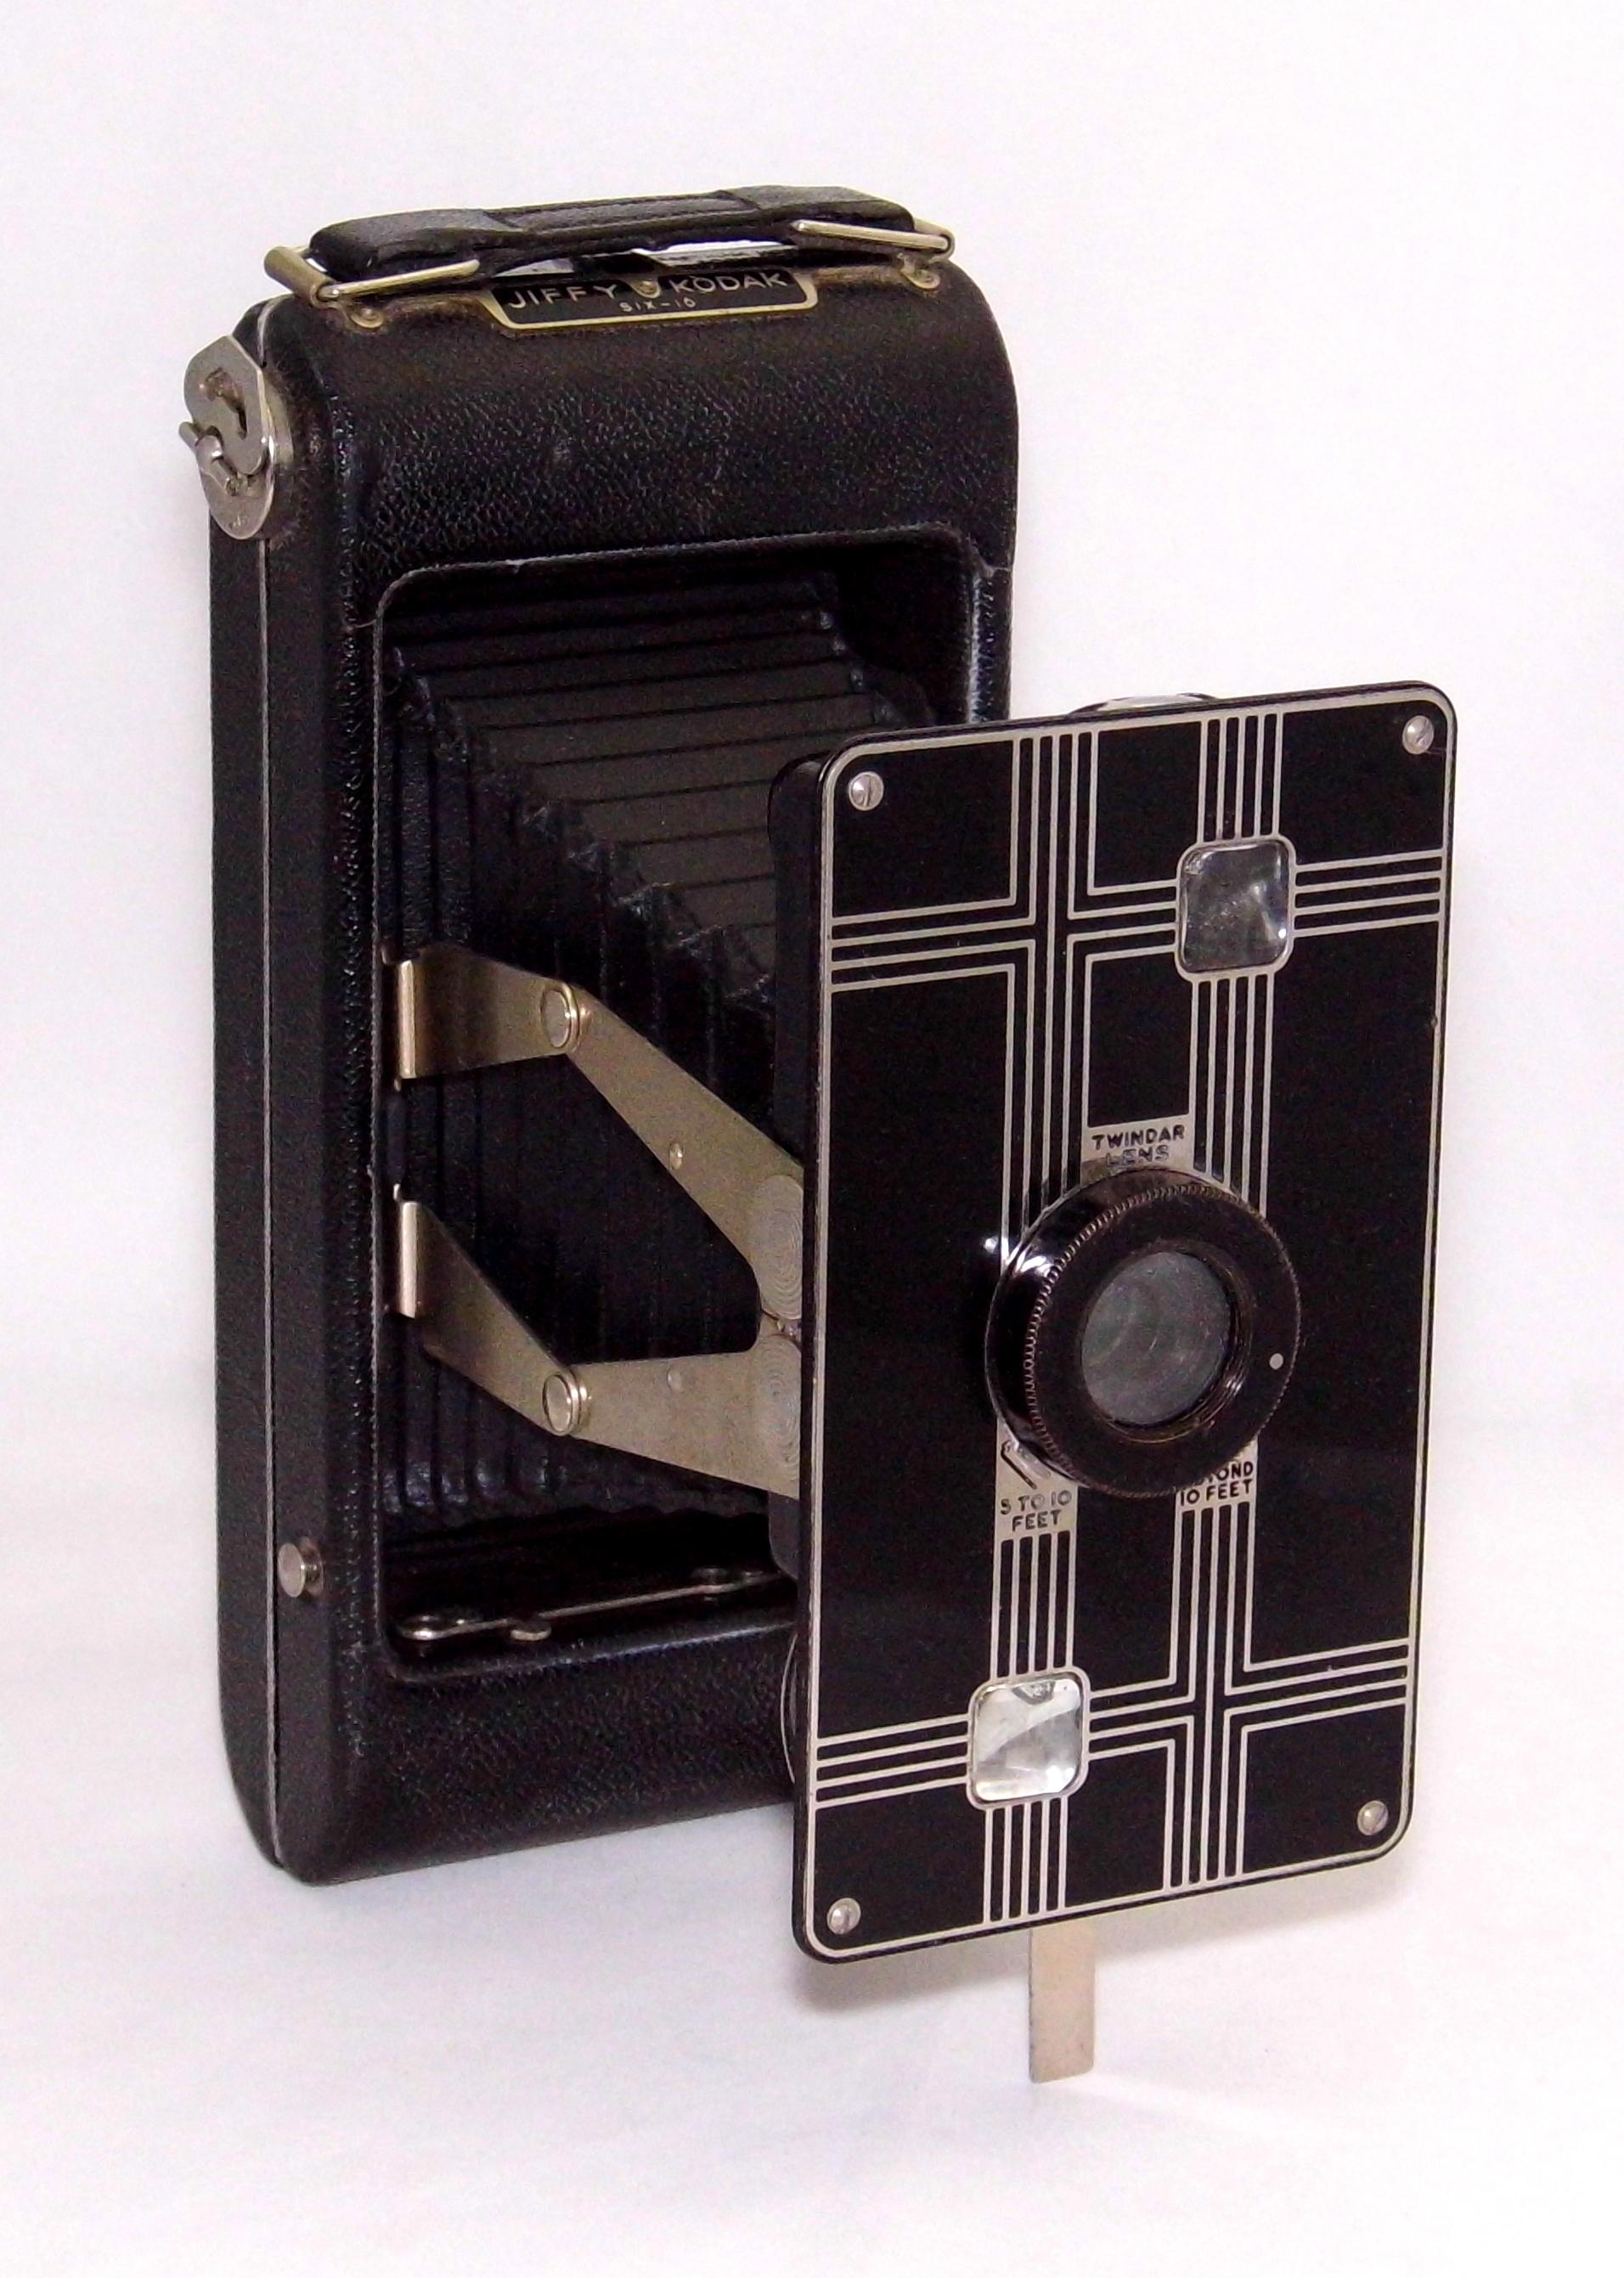 Filevintage Kodak Jiffy Six 16 Folding Film Camera 616 Film Made